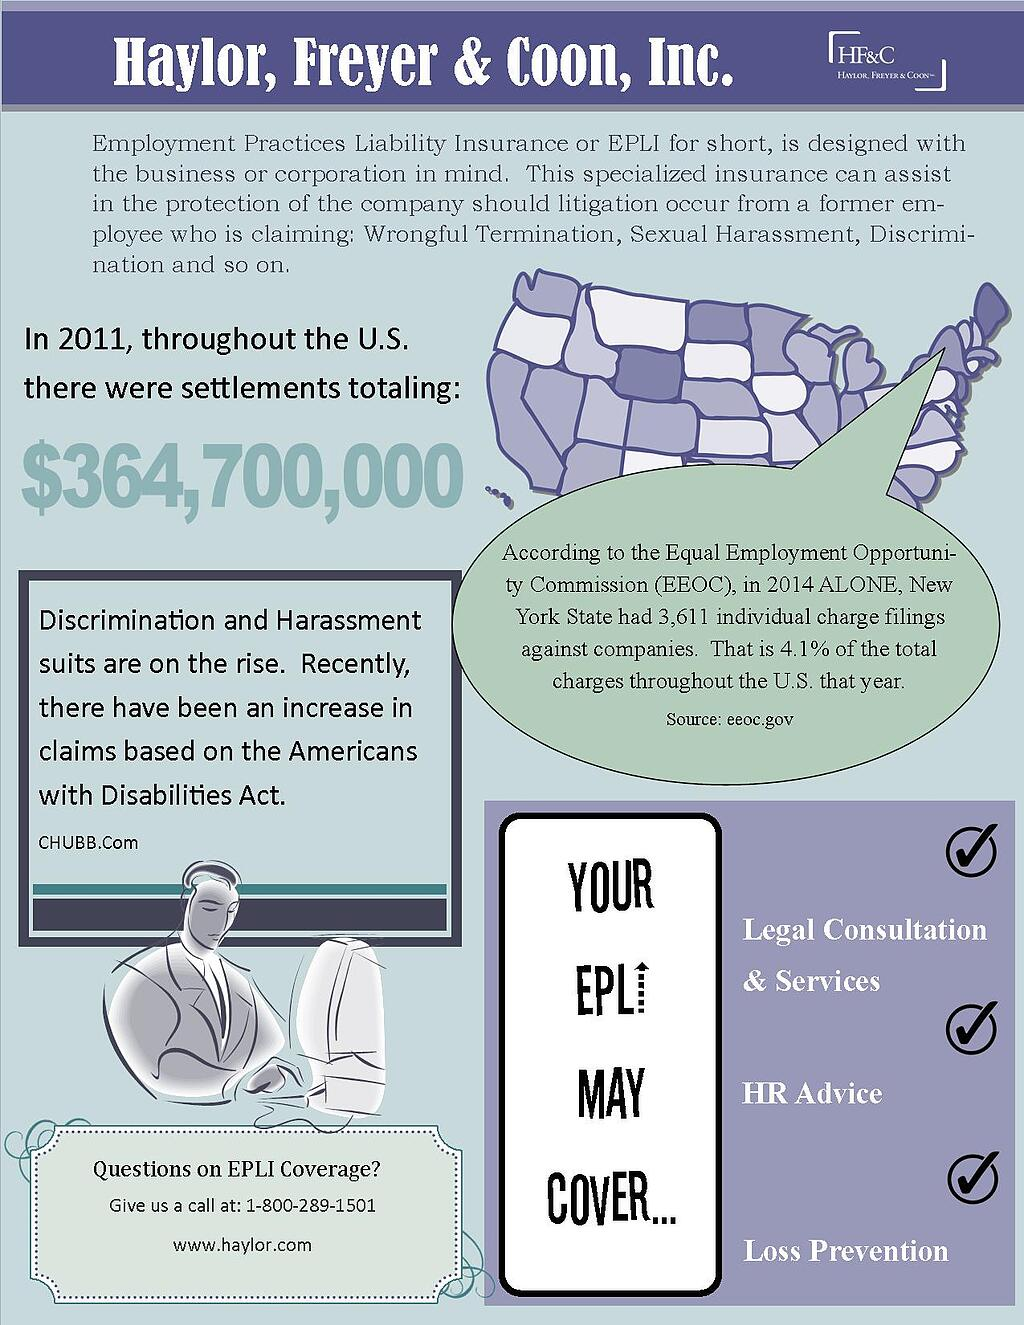 EPLI_Infographic.jpg